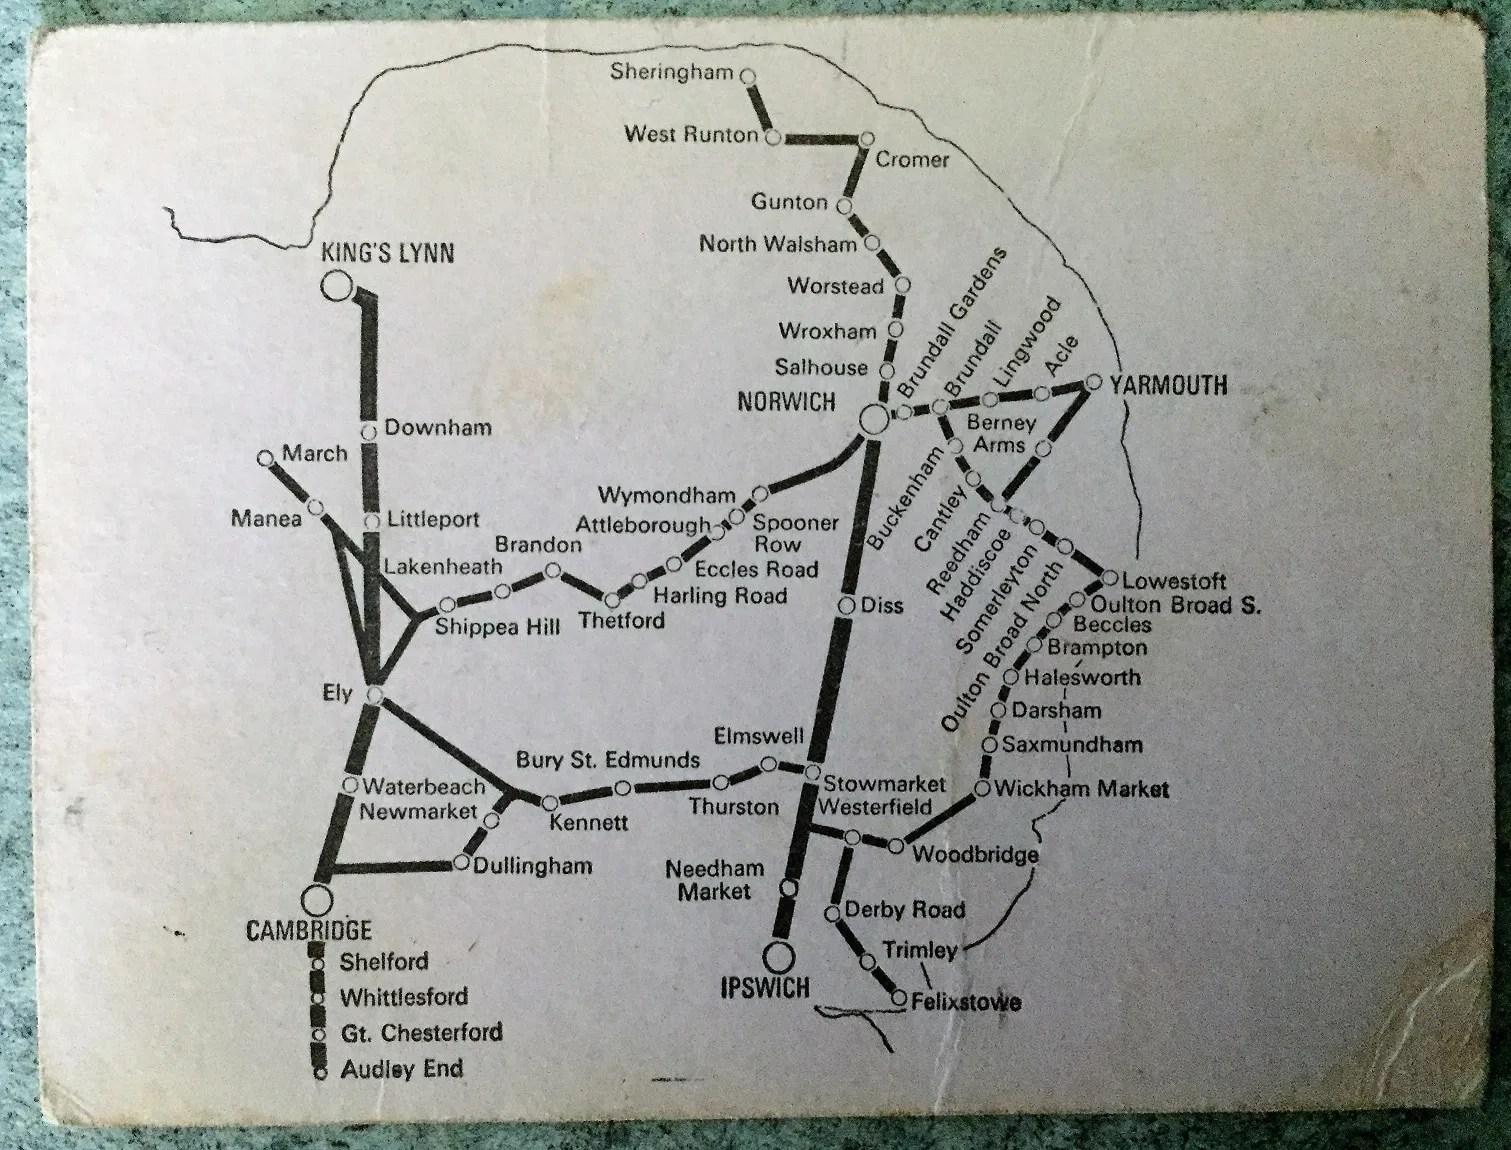 Anglian Ranger ticket showing British Rail Eastern Region map